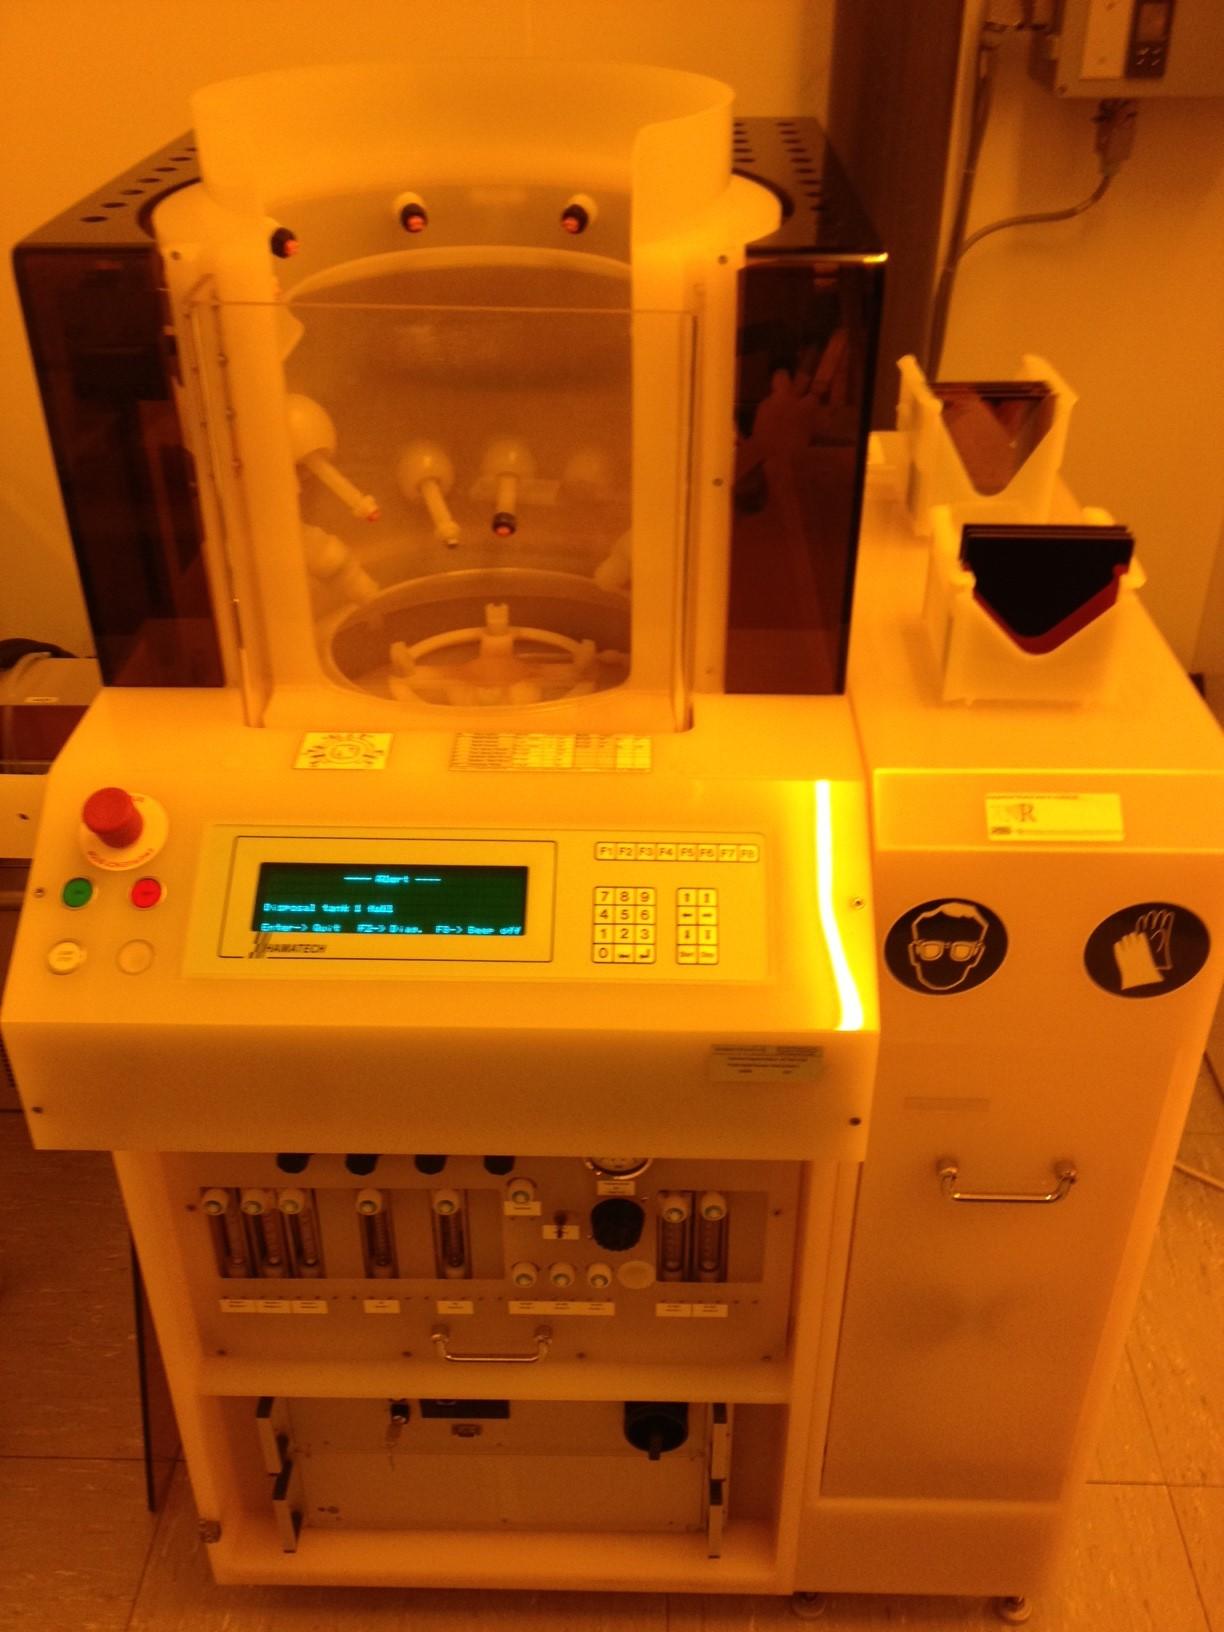 Picture of HMP 90 (L- DWL)